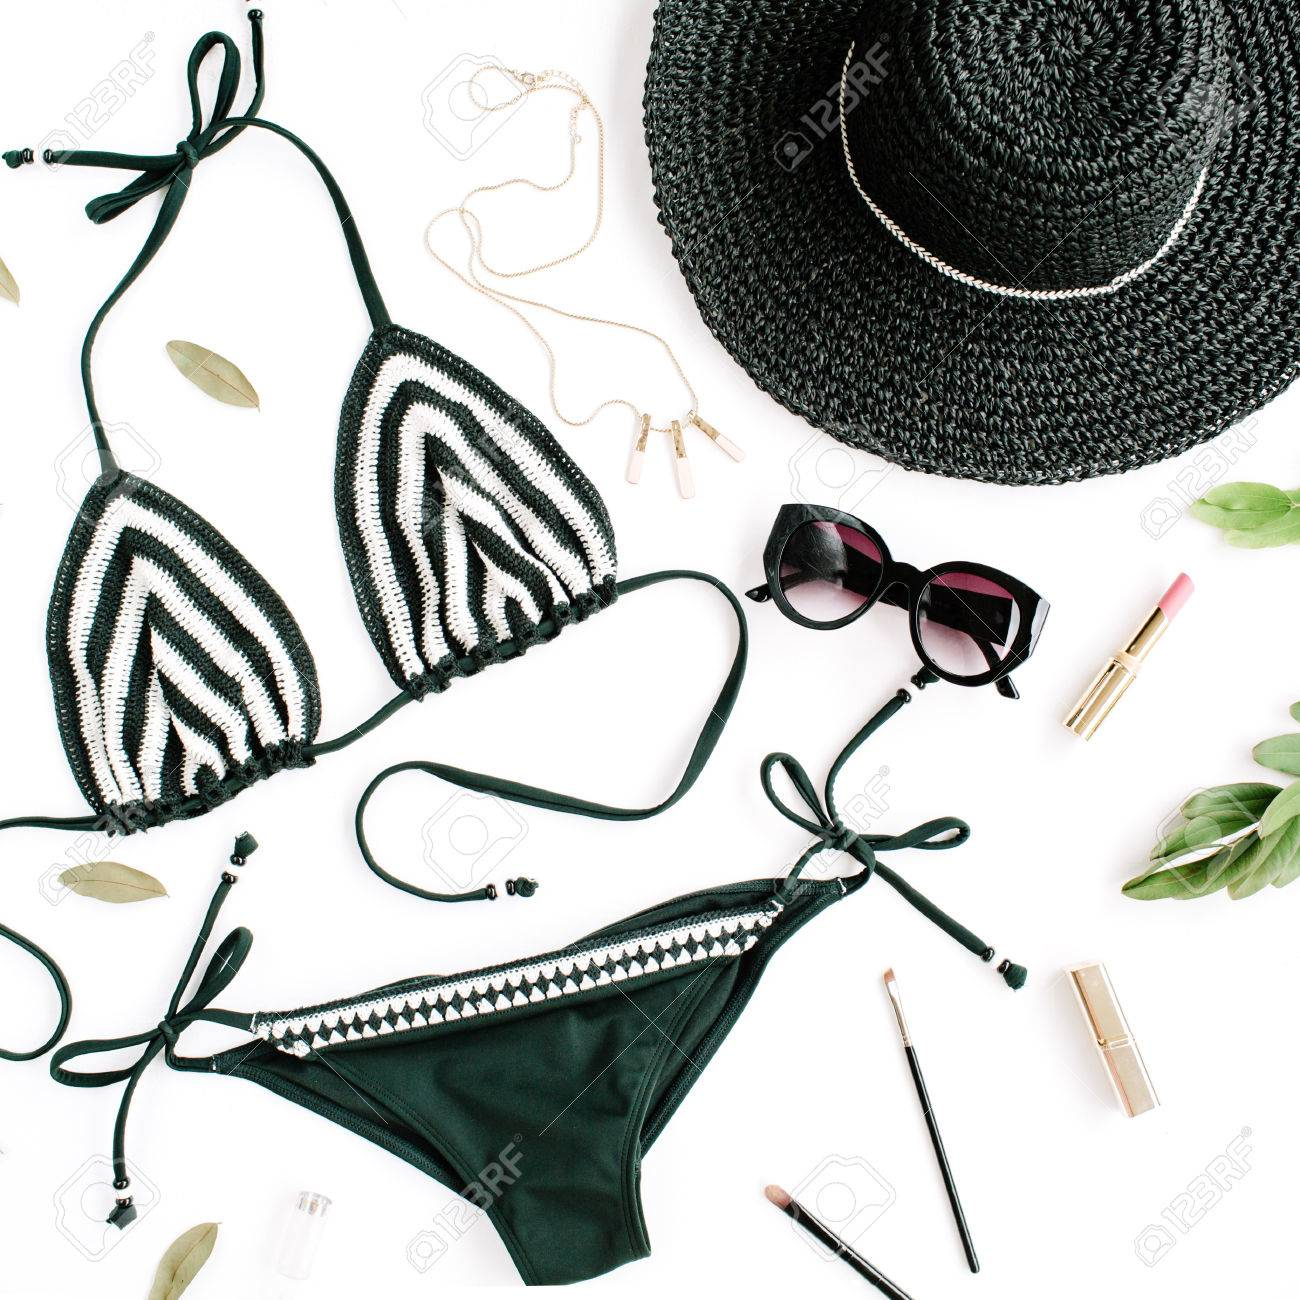 95997d3338 De Femenino Baño Verano Traje En Blanco Collage Bikini Accesorios lKc3JTF1